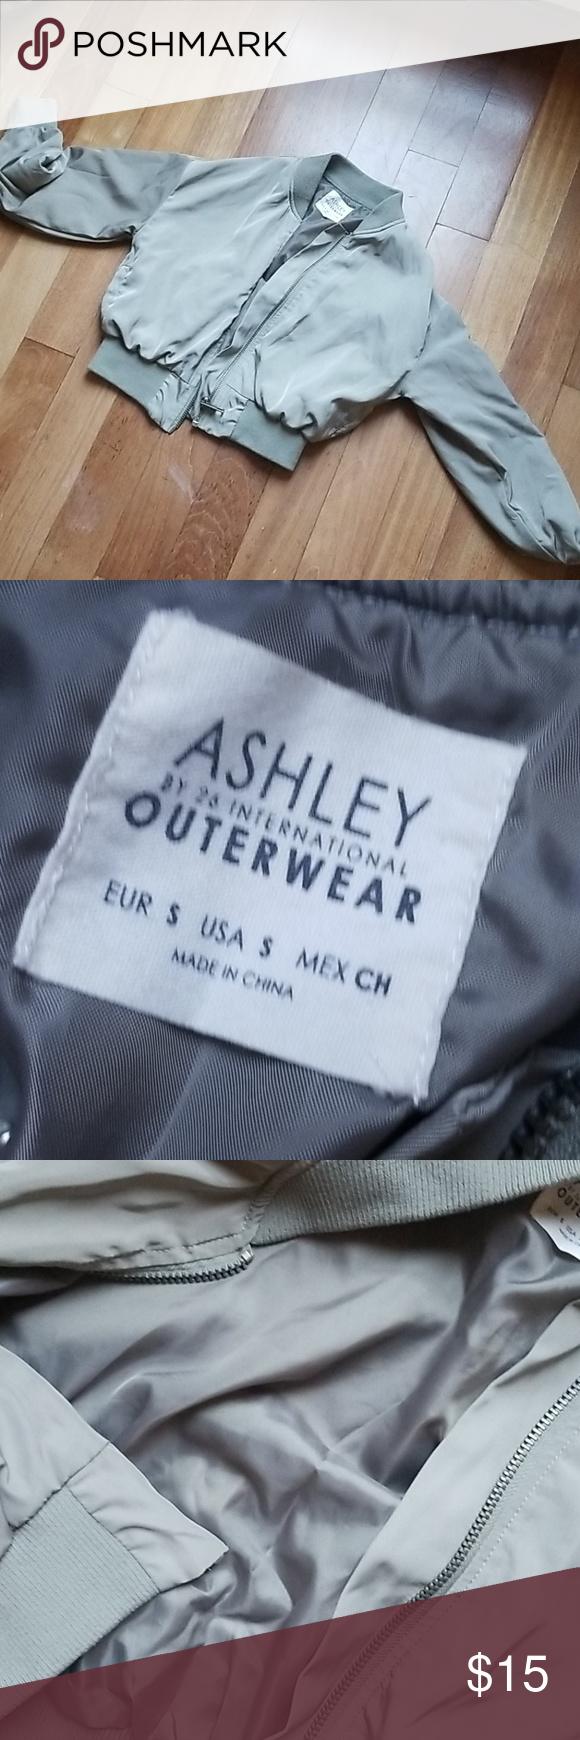 Ashley Outerwear By 26 International Green Zip Ups Outerwear Ashley [ 1740 x 580 Pixel ]